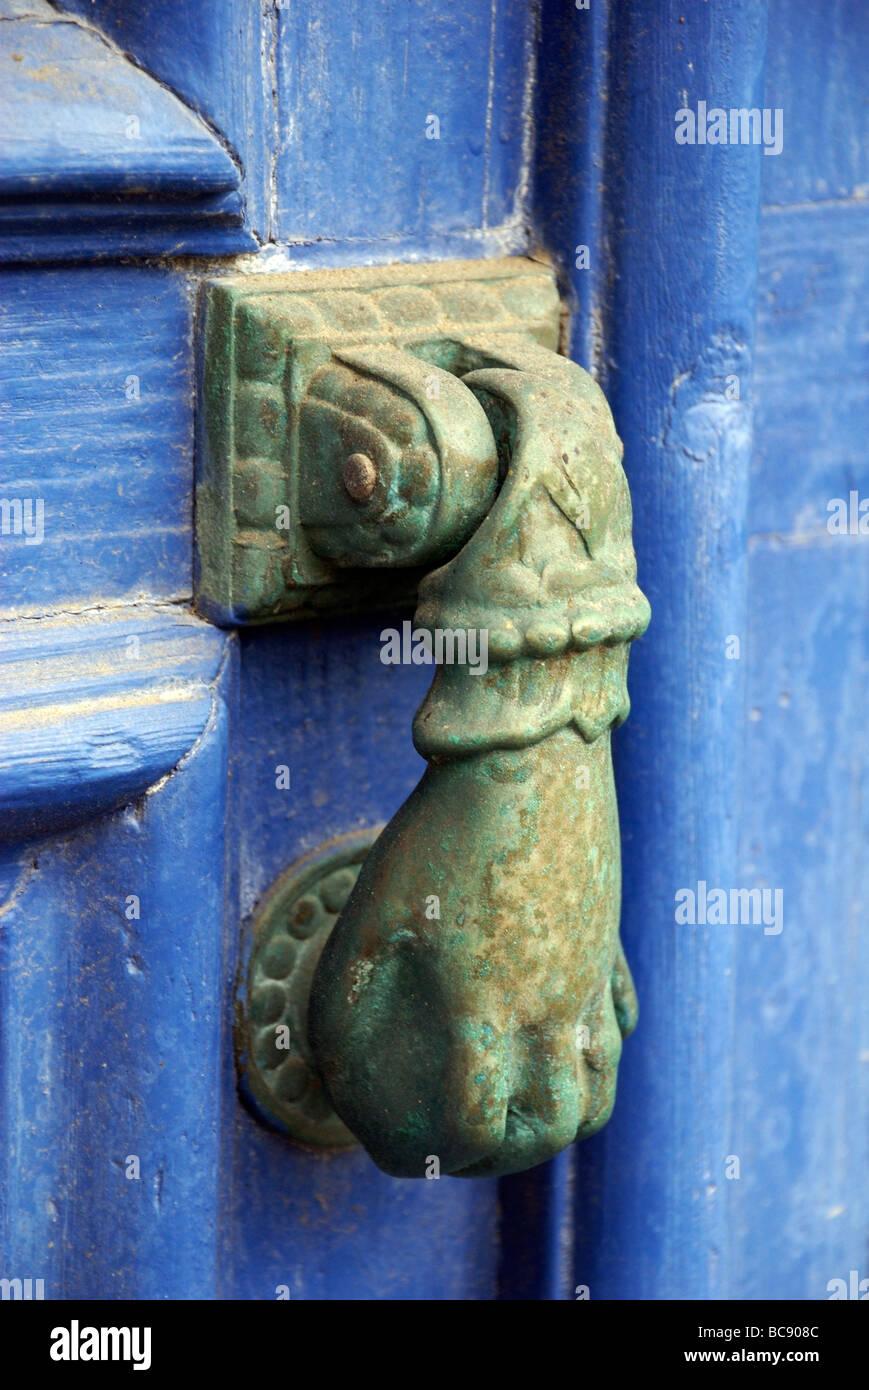 Merveilleux Decorative Door Knocker Hand Design, Roscoff, Brittany, France   Stock Image